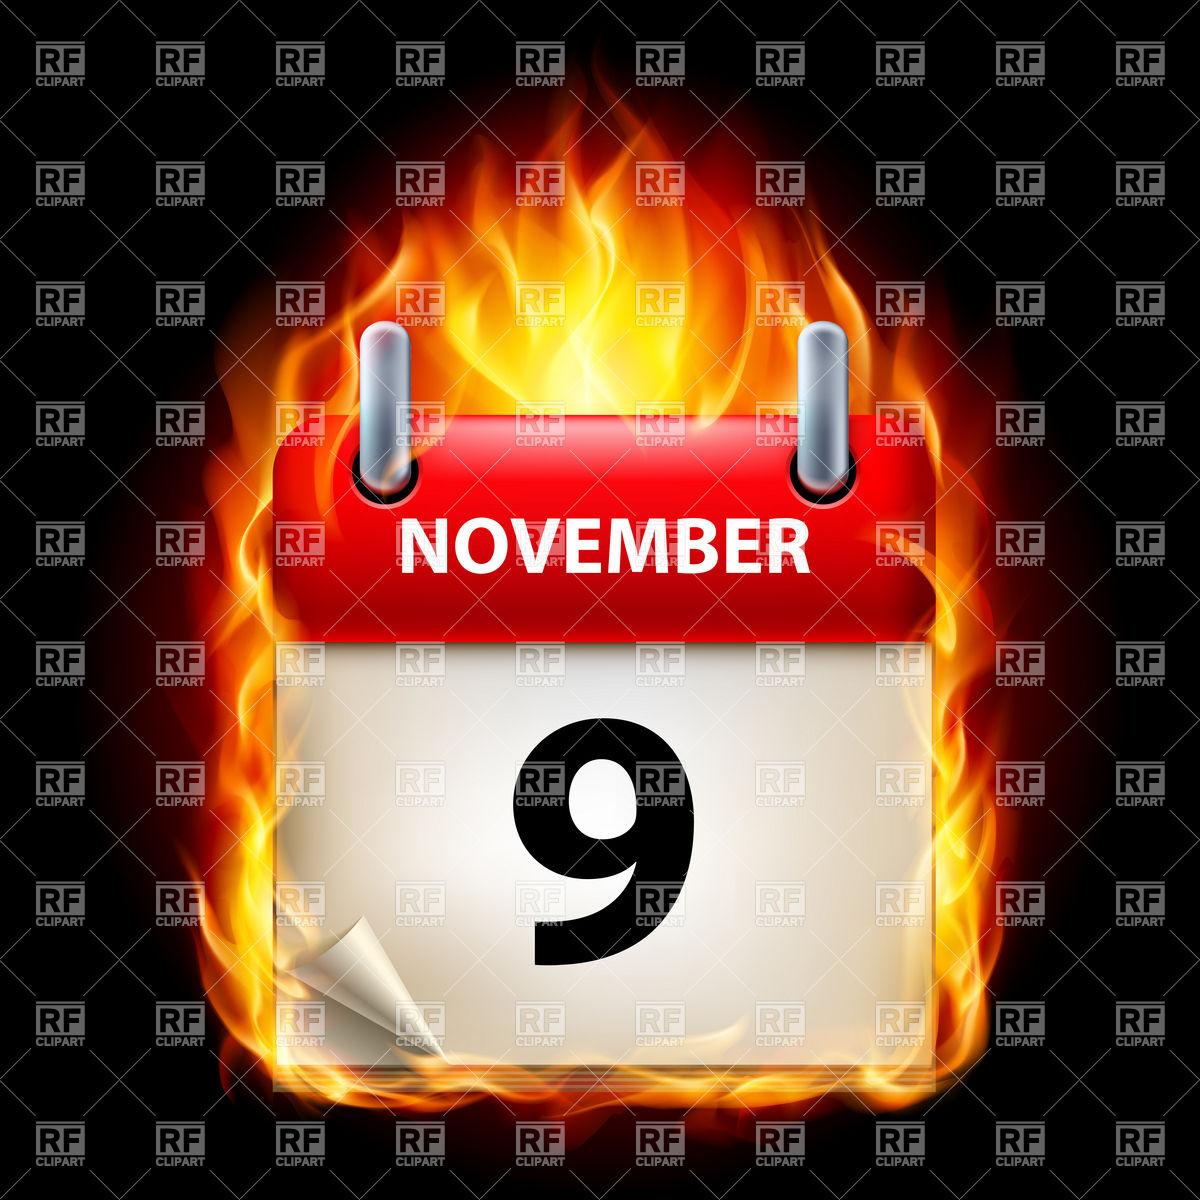 November 9th calendar clipart image royalty free Fiery calendar icon November 9 Vector Image #8975 – RFclipart image royalty free